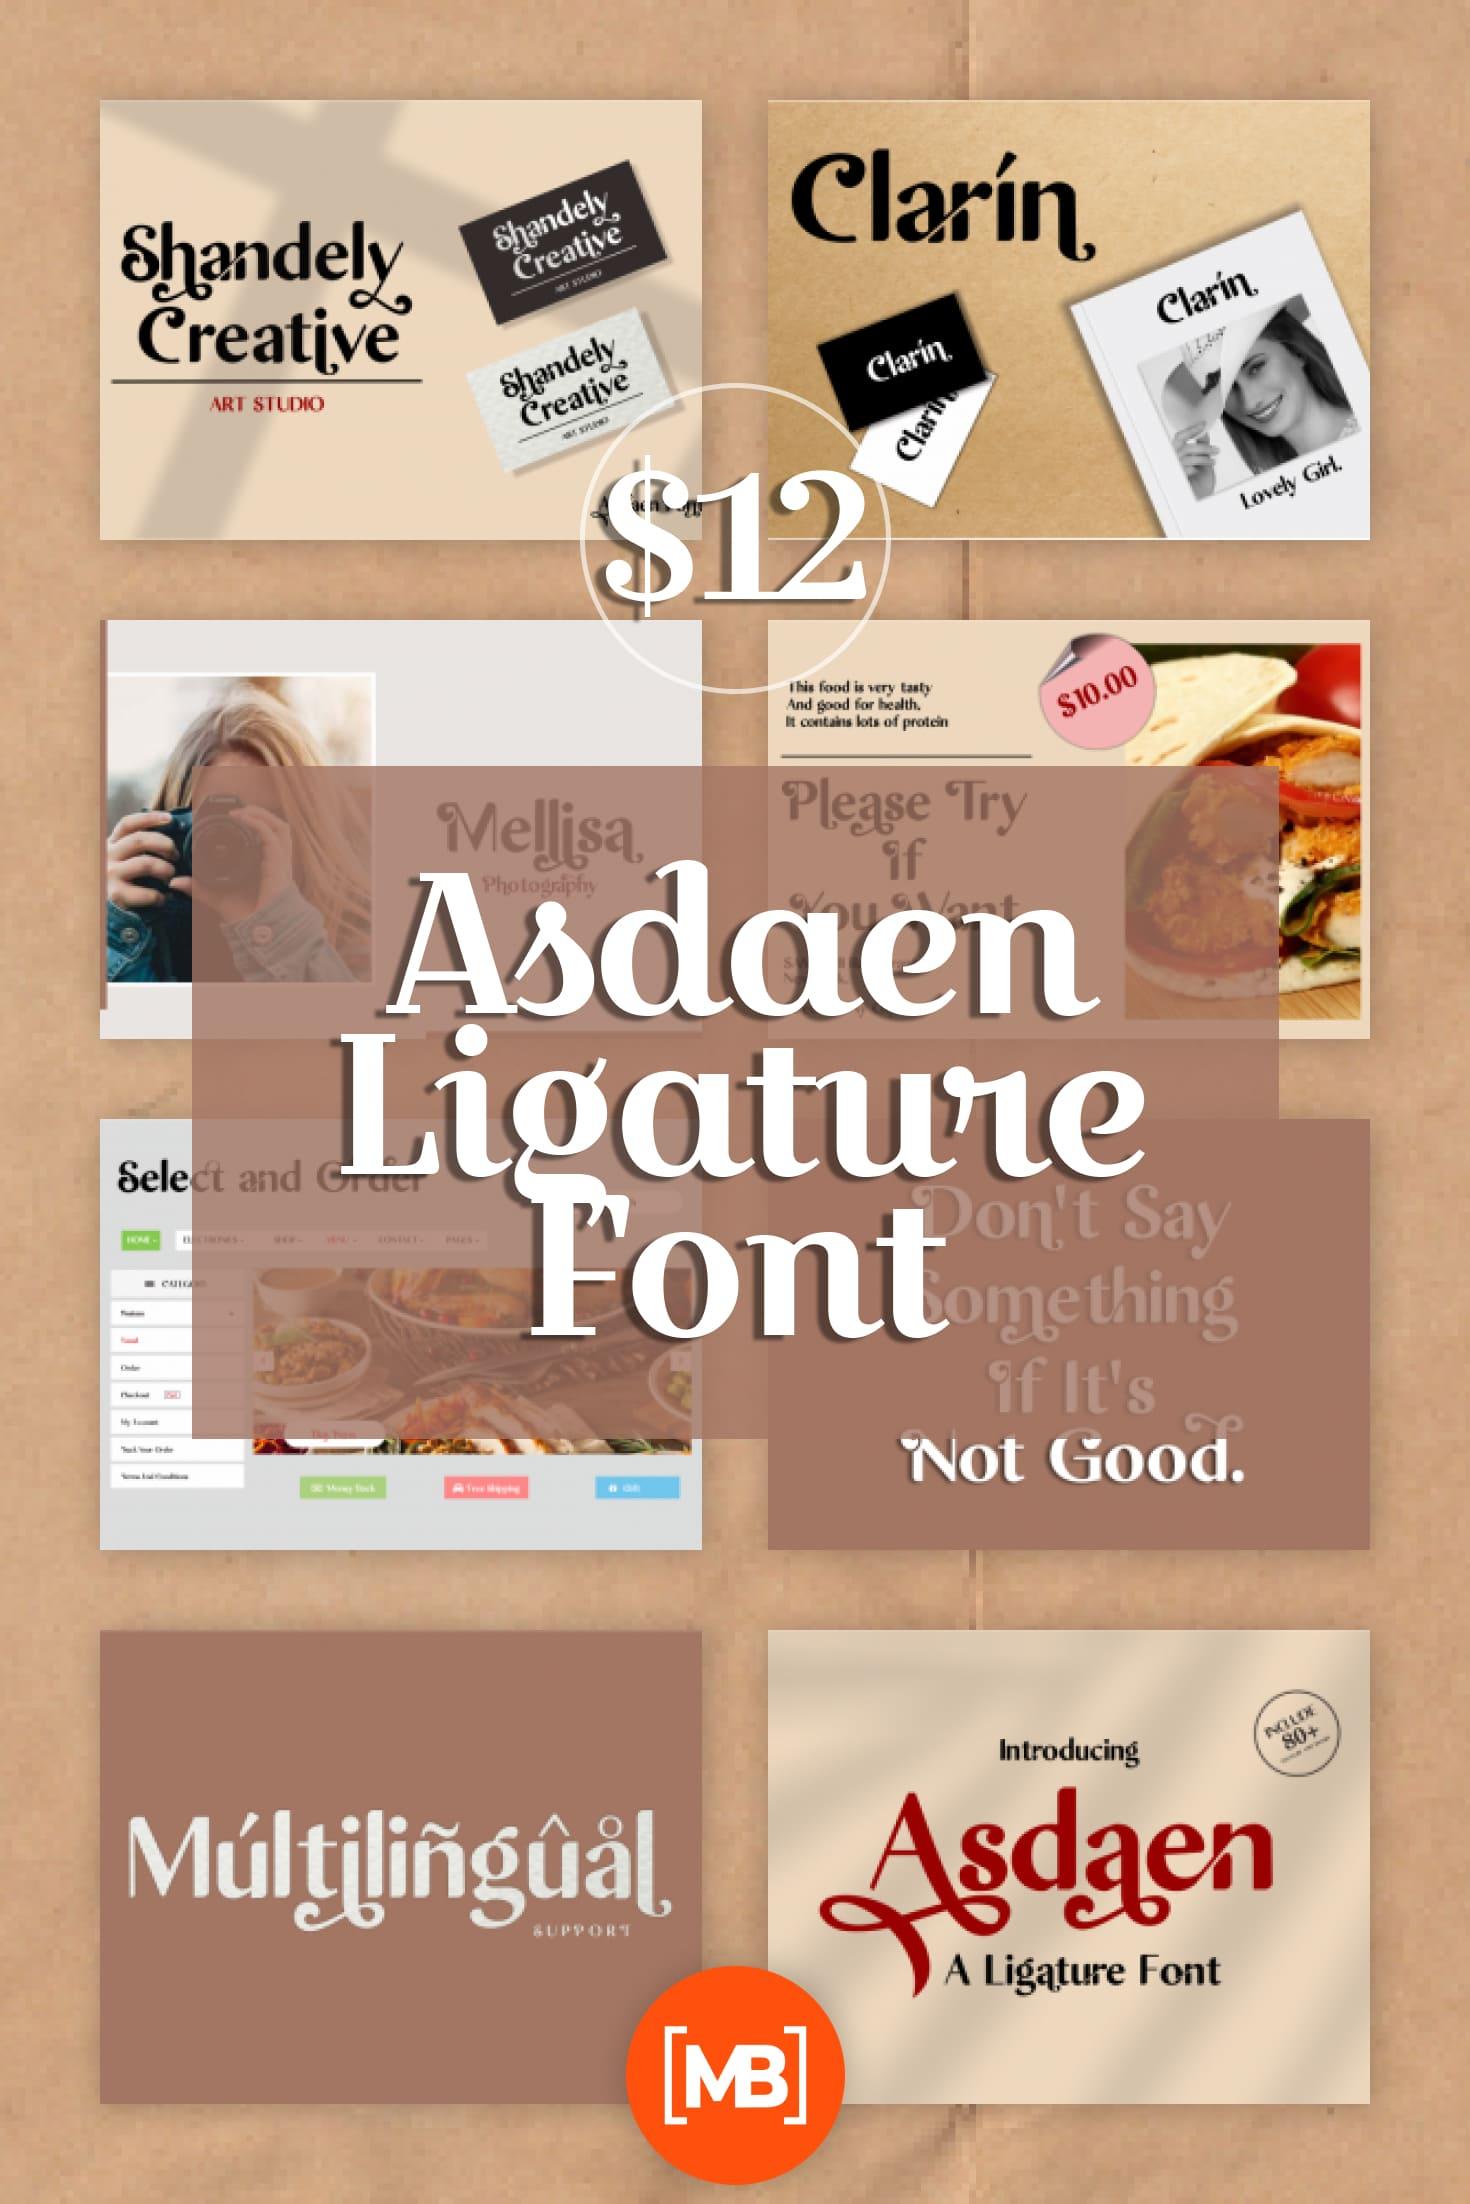 Pinterest Image: Asdaen Ligature Font - $12.